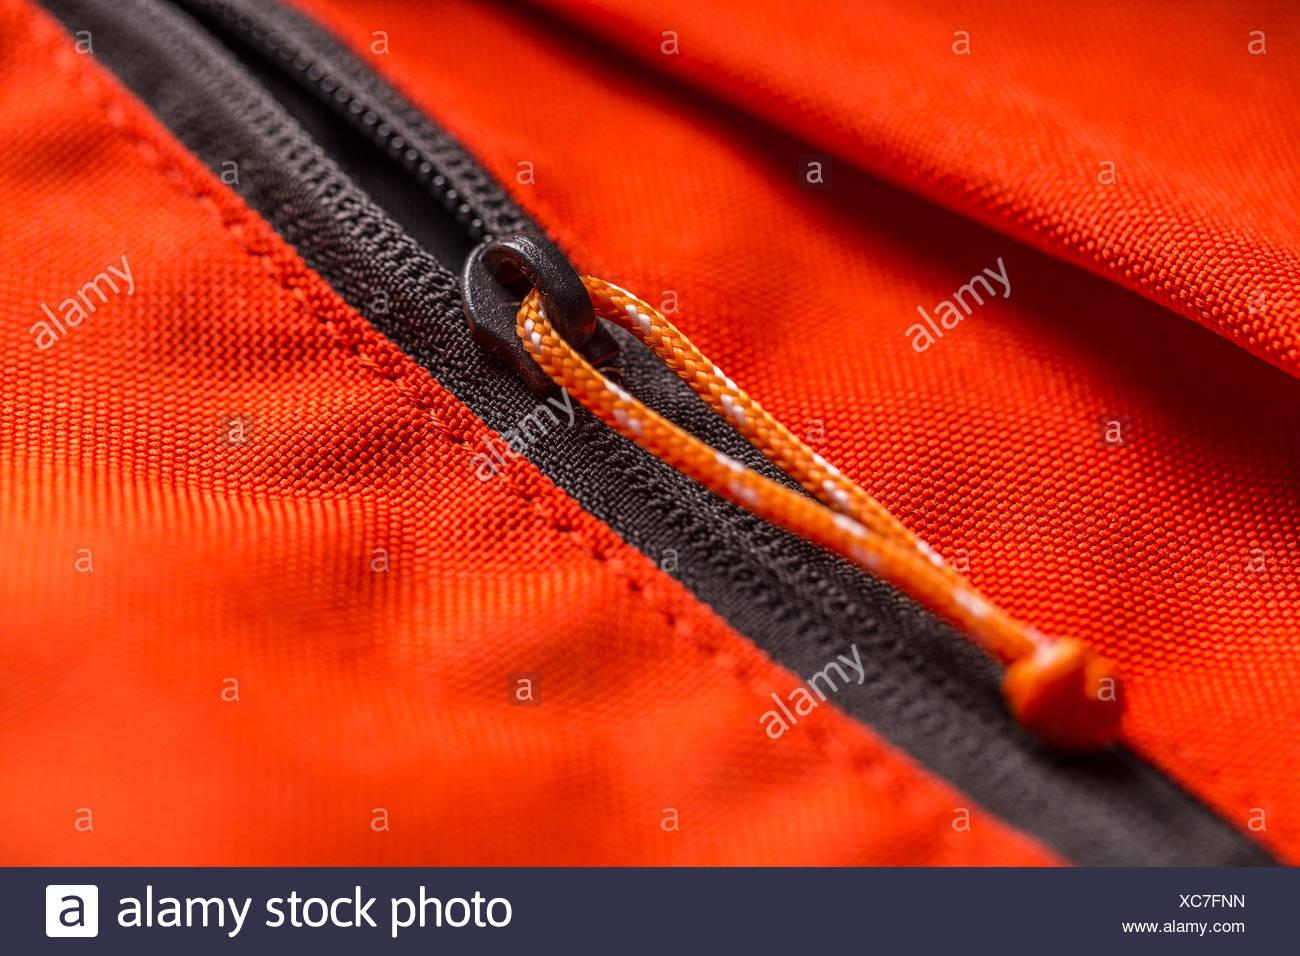 Zippered red bag pocket - Stock Image